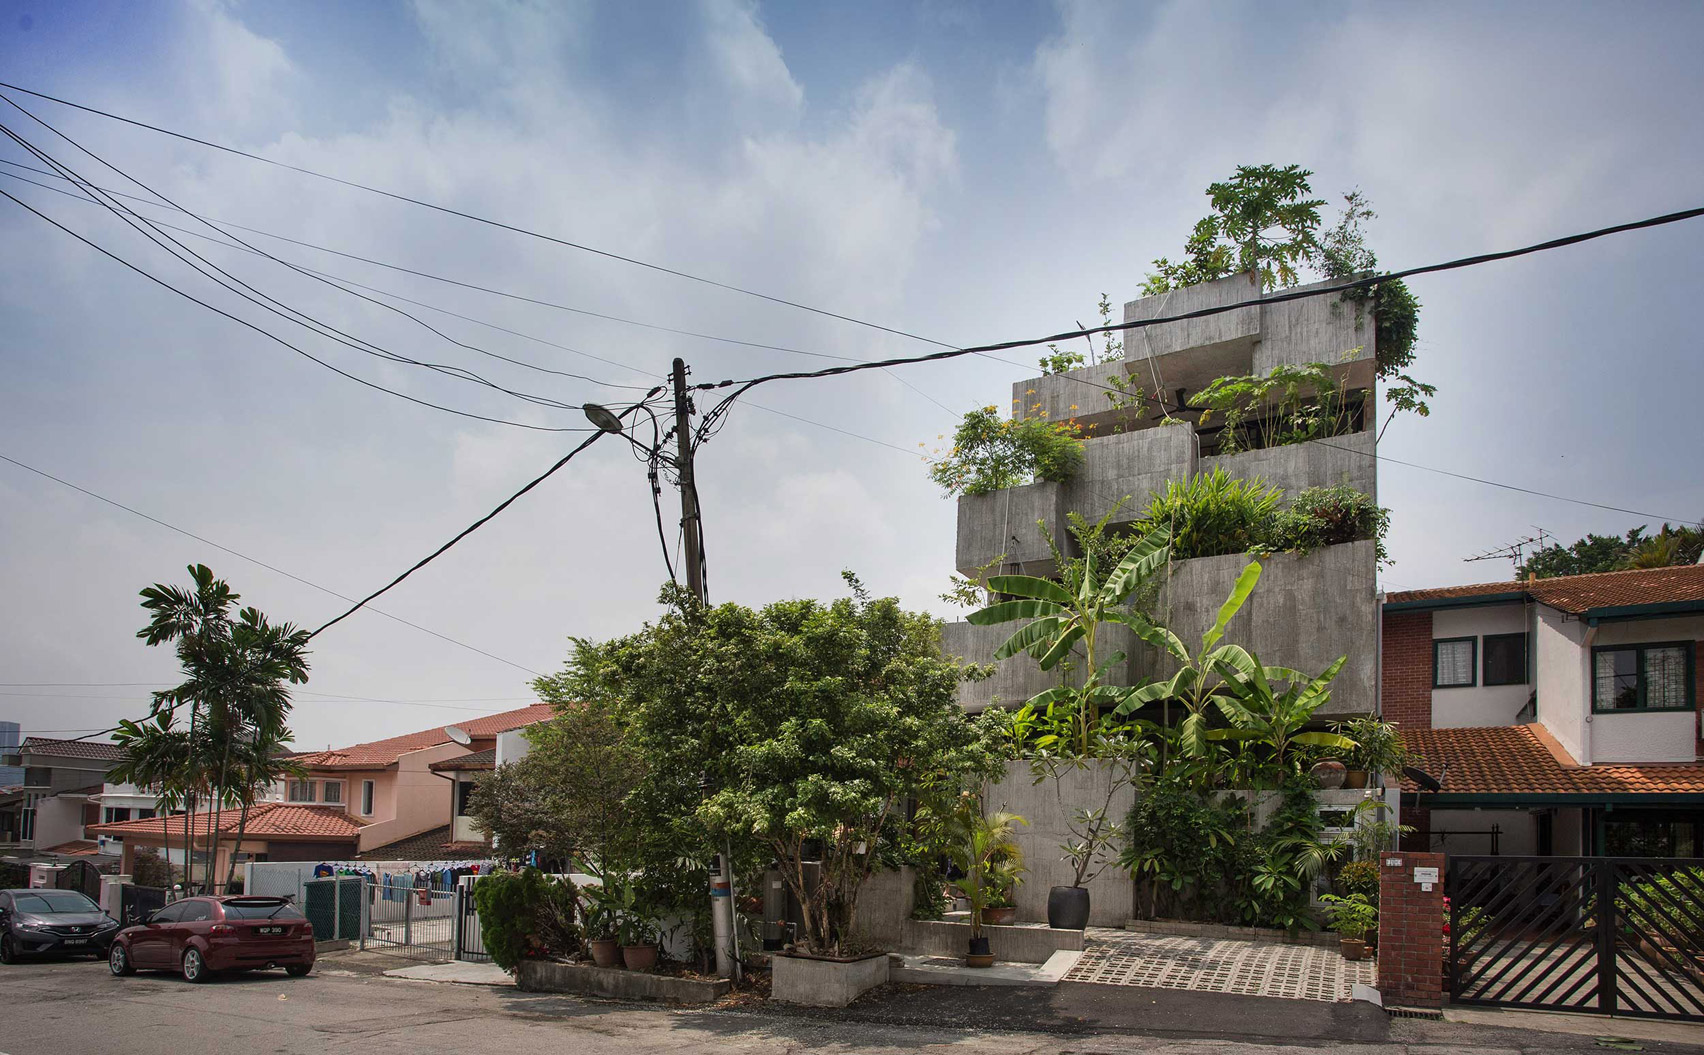 planter-box-house-formzero-architecture-kuala-lumpur-malaysia-sustainability_dezeen_1704_col_13.jpg